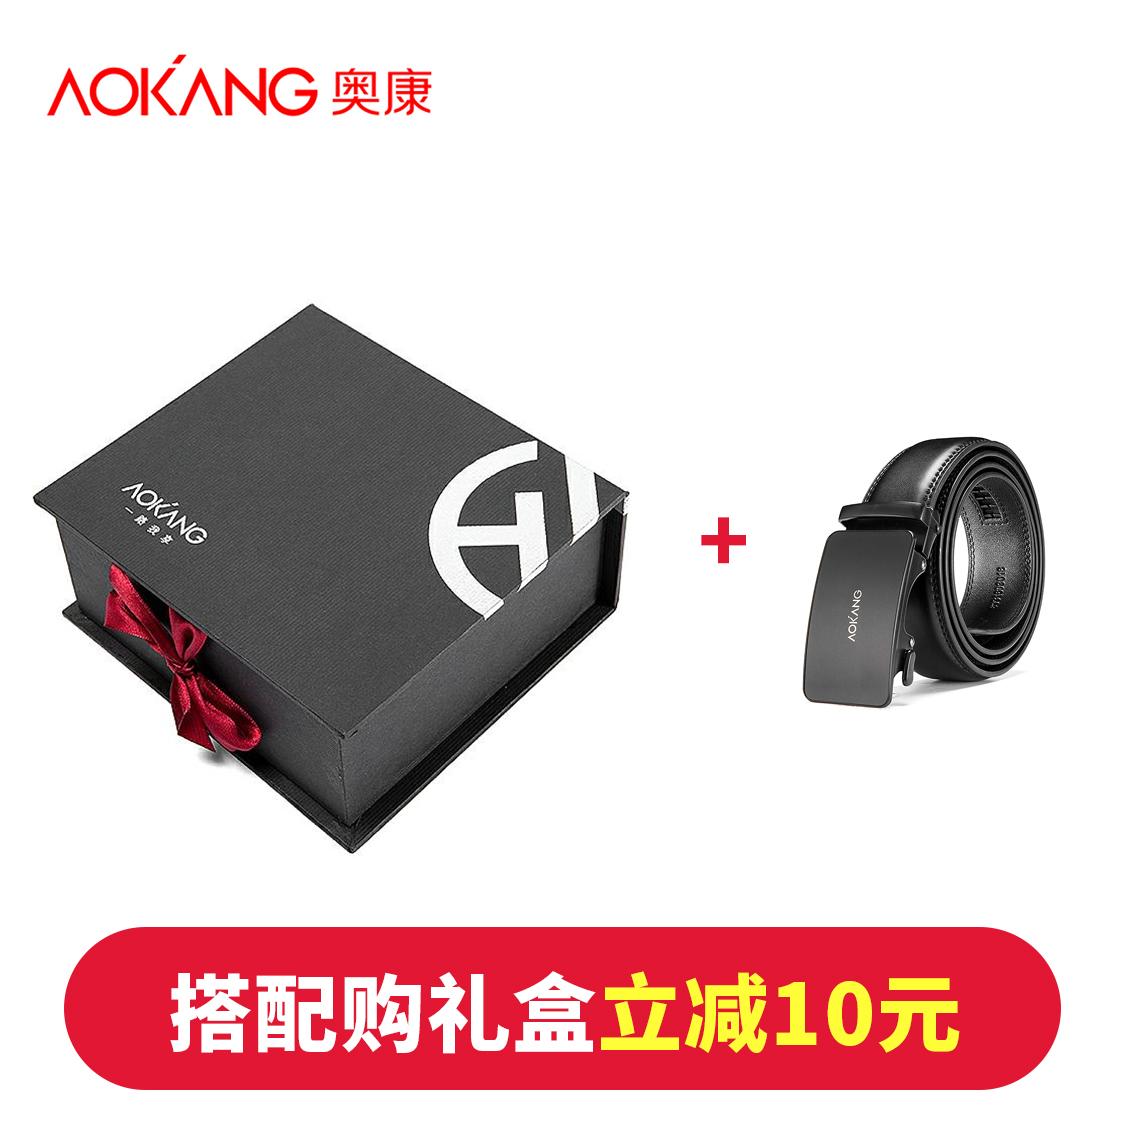 ∧OK∧NG奥康搭配购礼盒立减10元-推好价   品质生活 精选好价